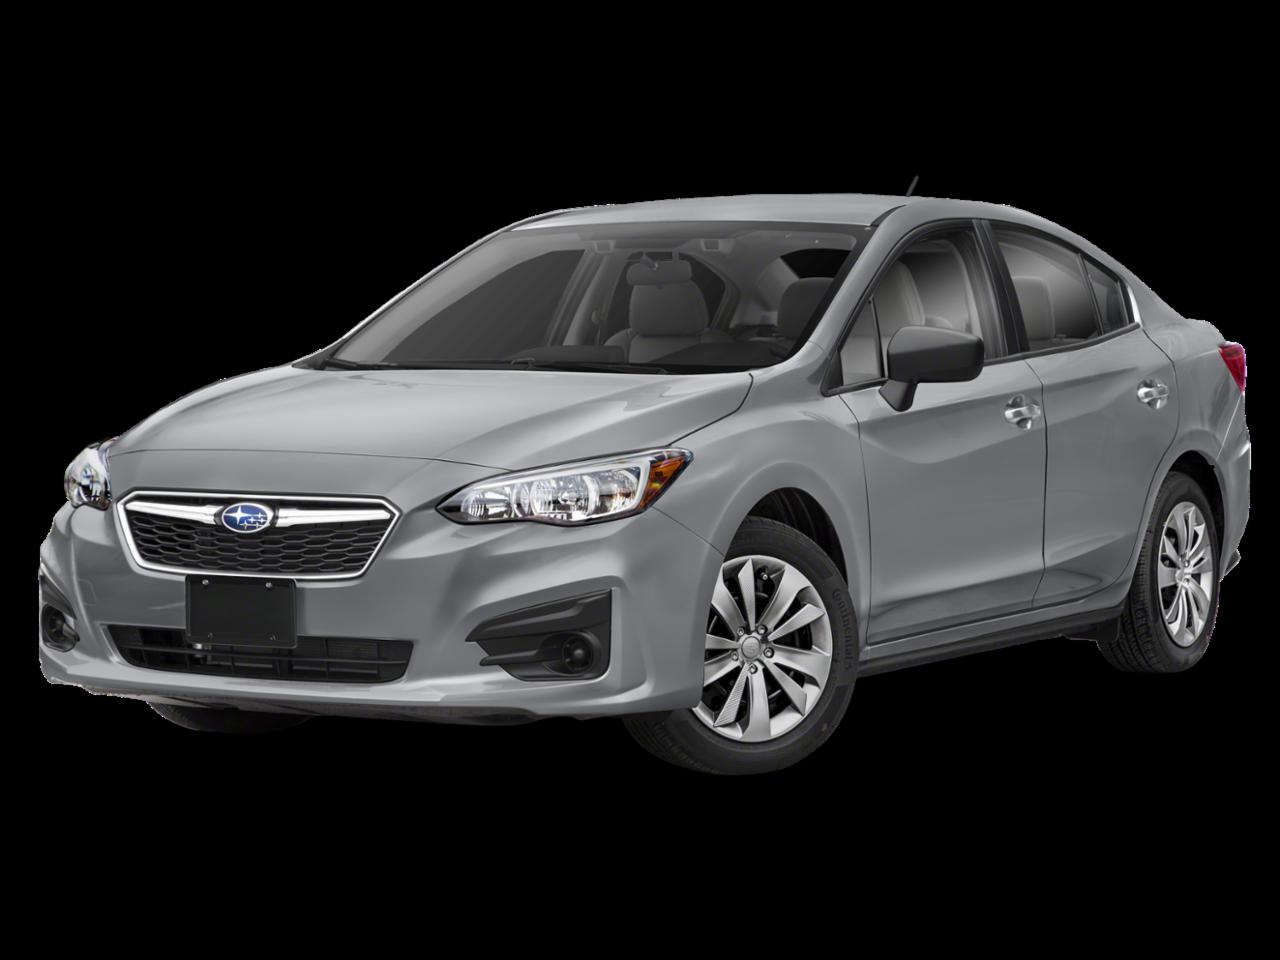 "2019 Subaru<br/><span class=""vdp-trim"">Impreza 2.0i Premium AWD 4dr Car</span>"